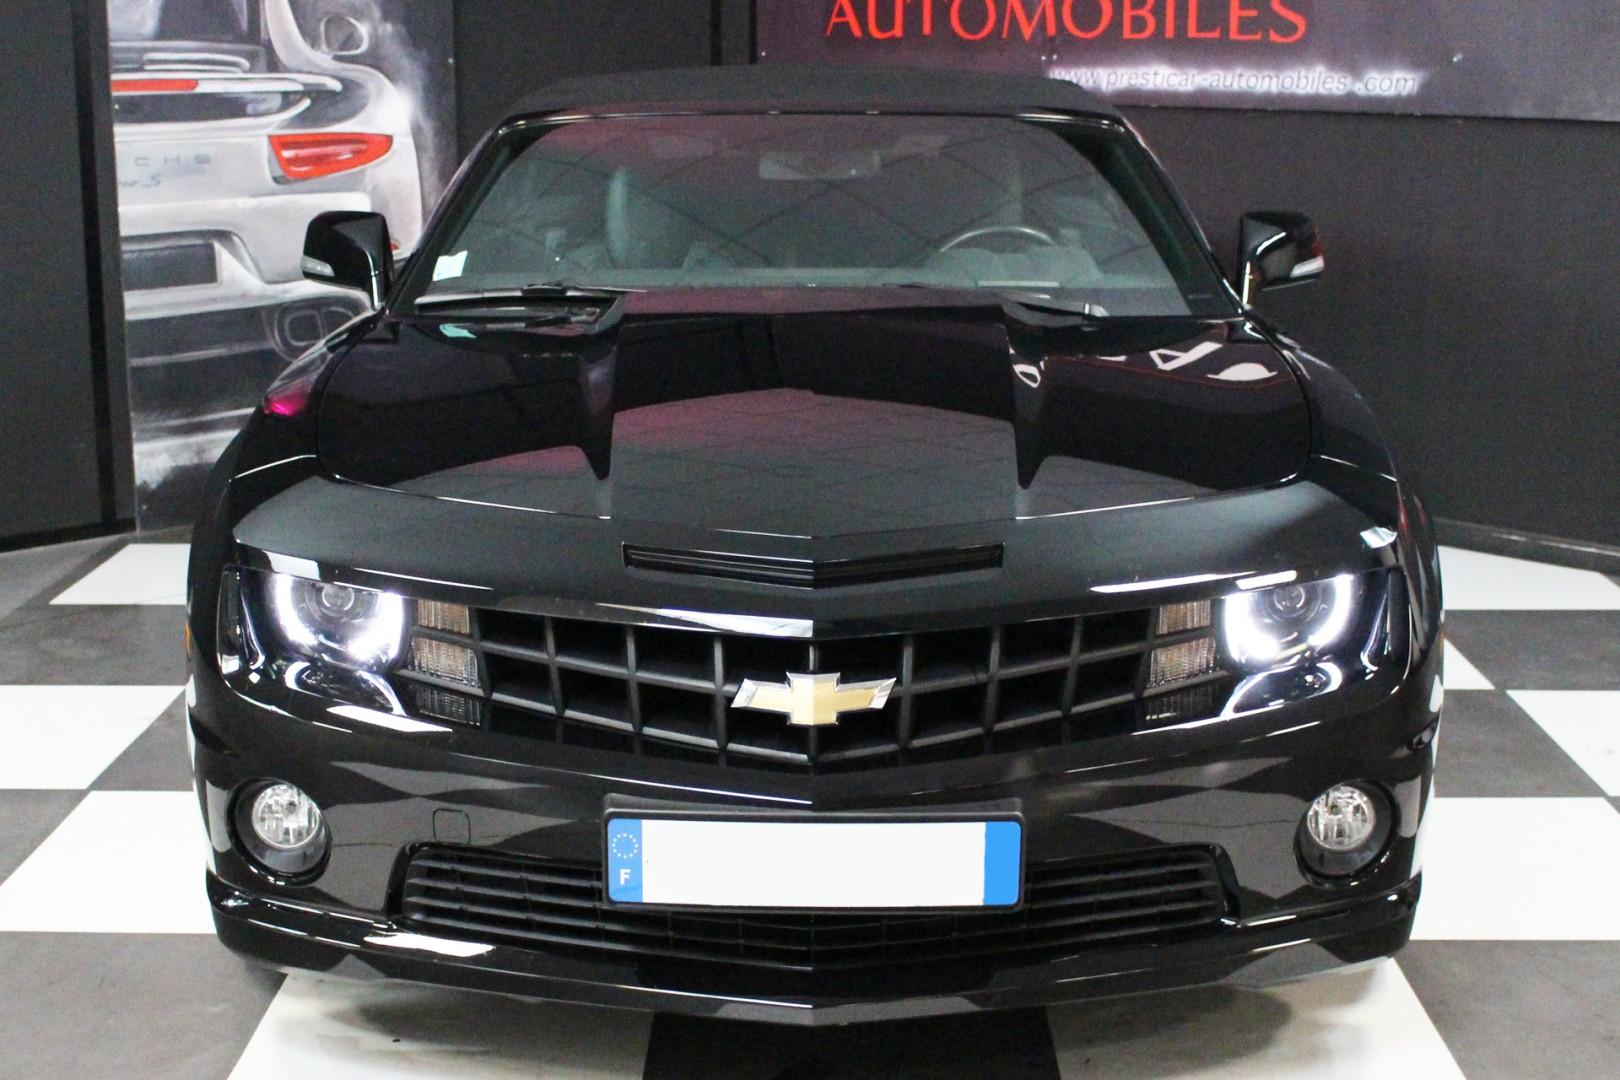 chevrolet camaro 6 2 v8 432ch cabriolet presticar automobiles. Black Bedroom Furniture Sets. Home Design Ideas